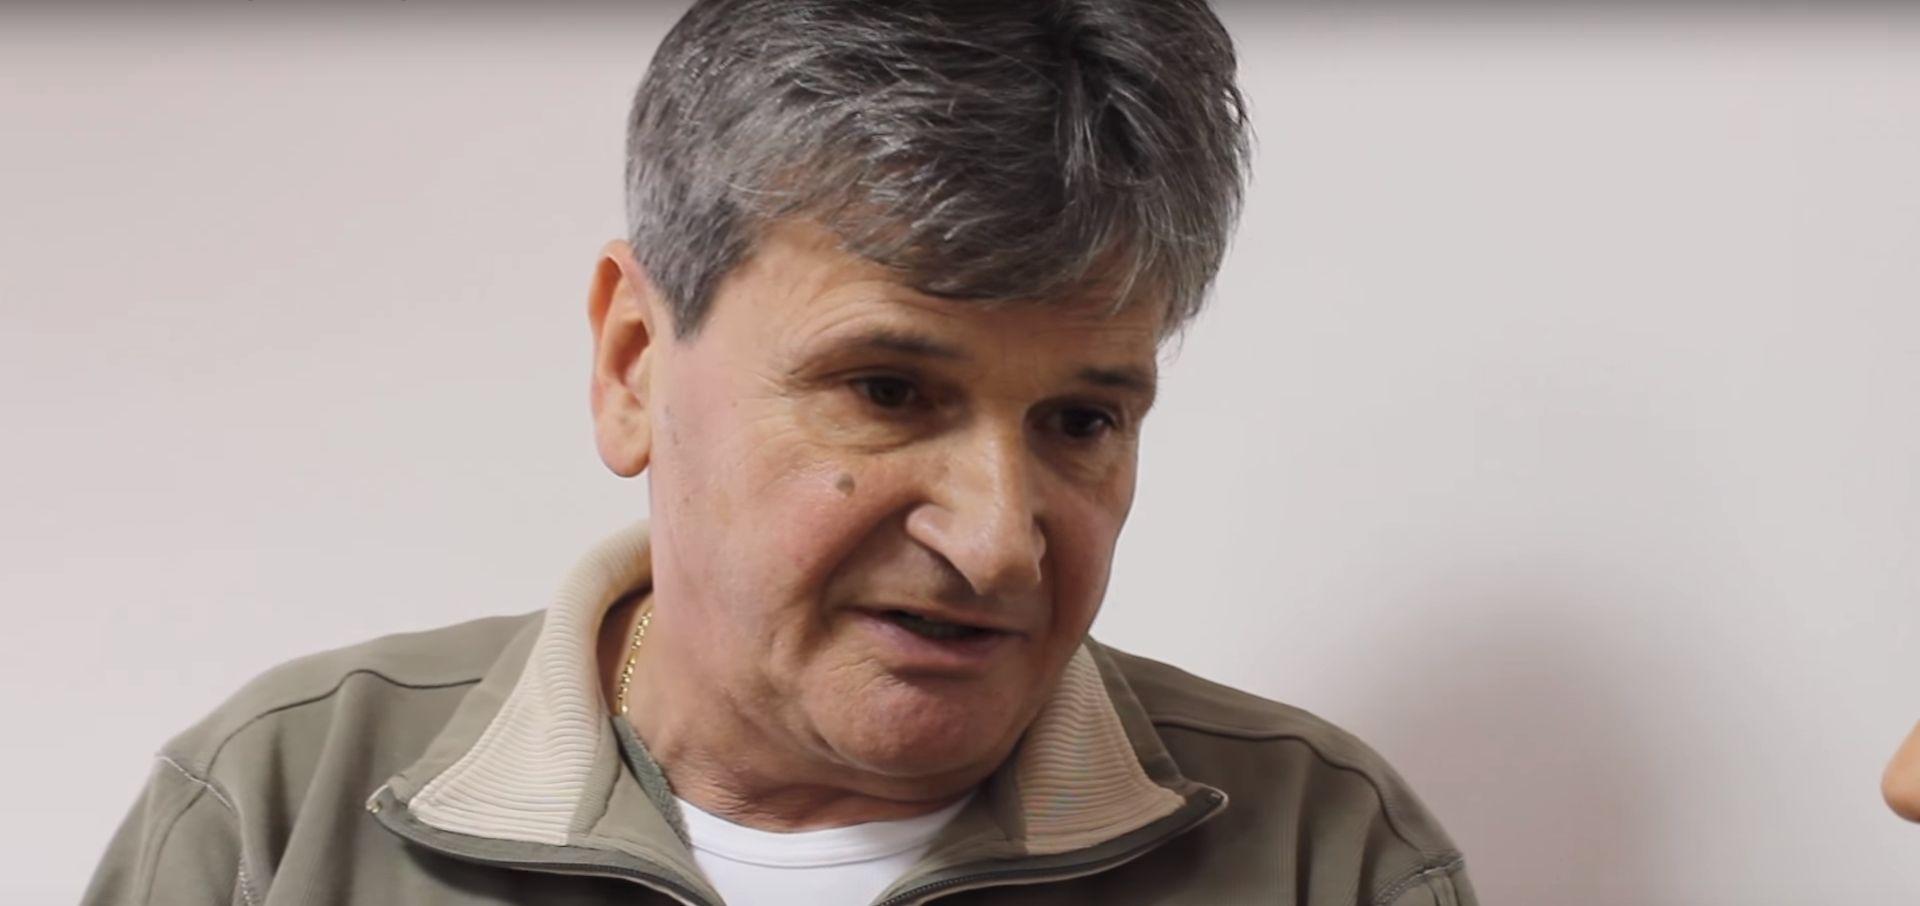 Preminuo bivši predsjednik HKS-a Danko Radić